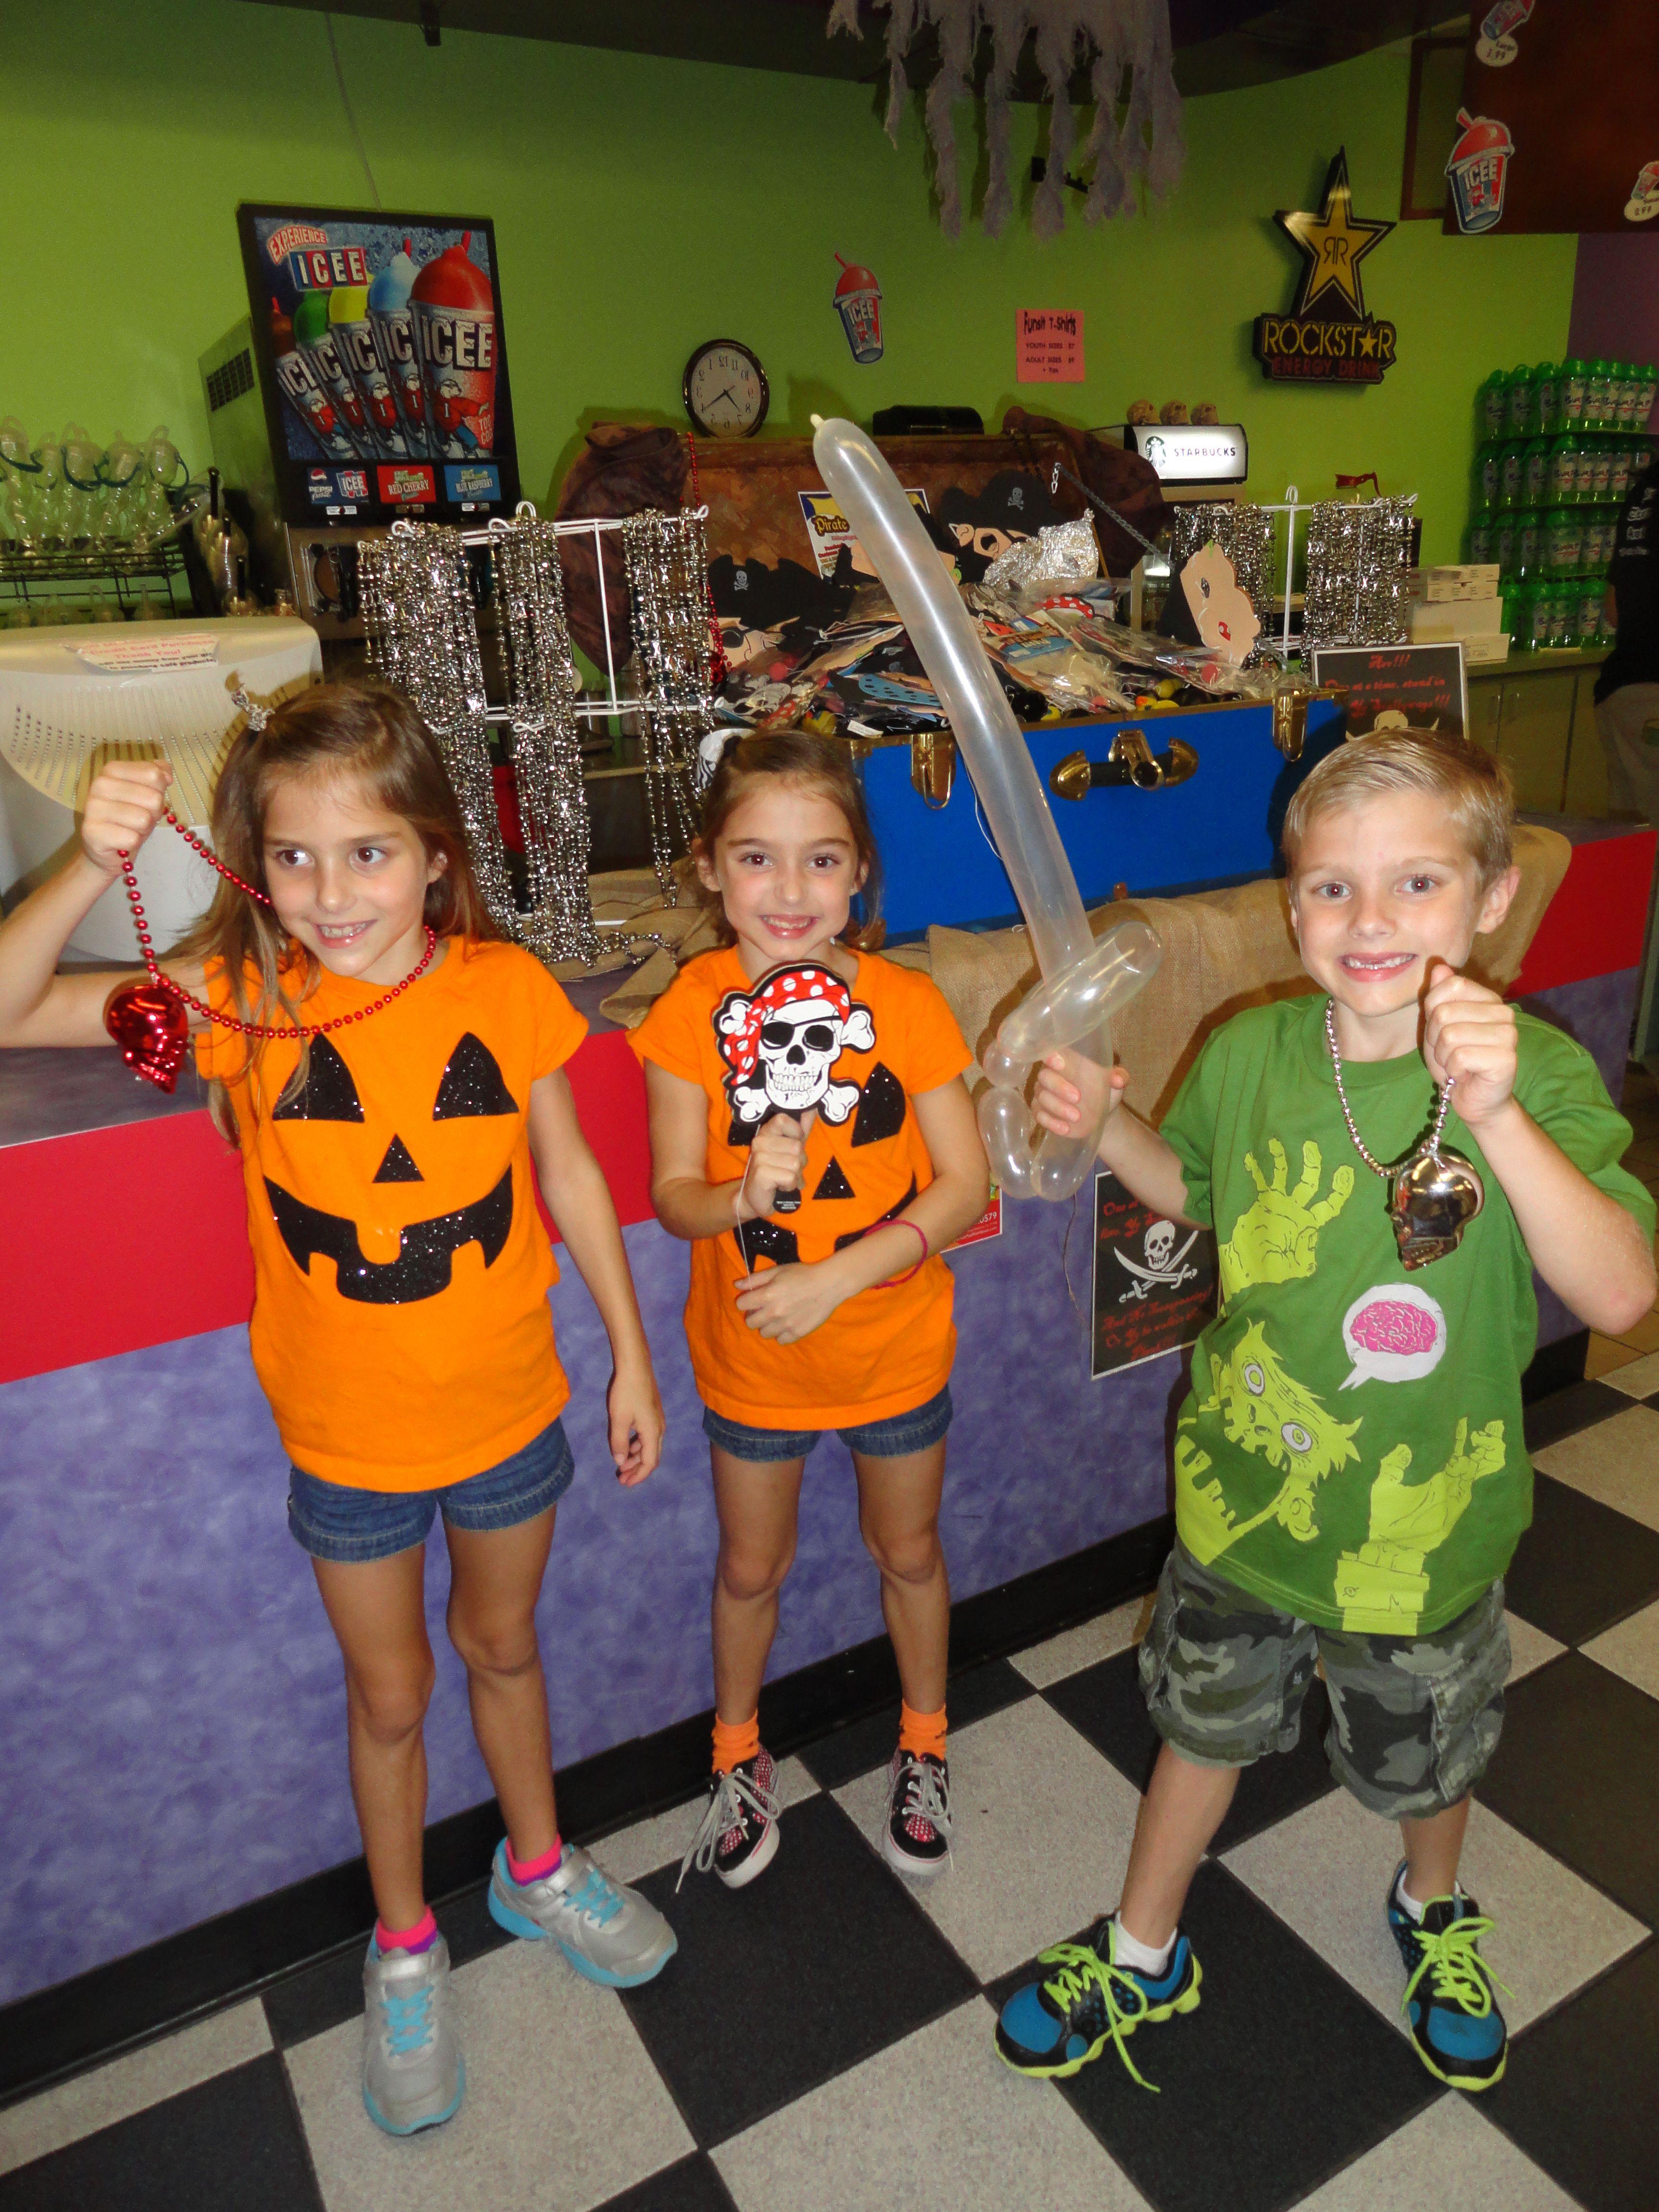 Family Treasure Hunt At Putt Putt Fun House